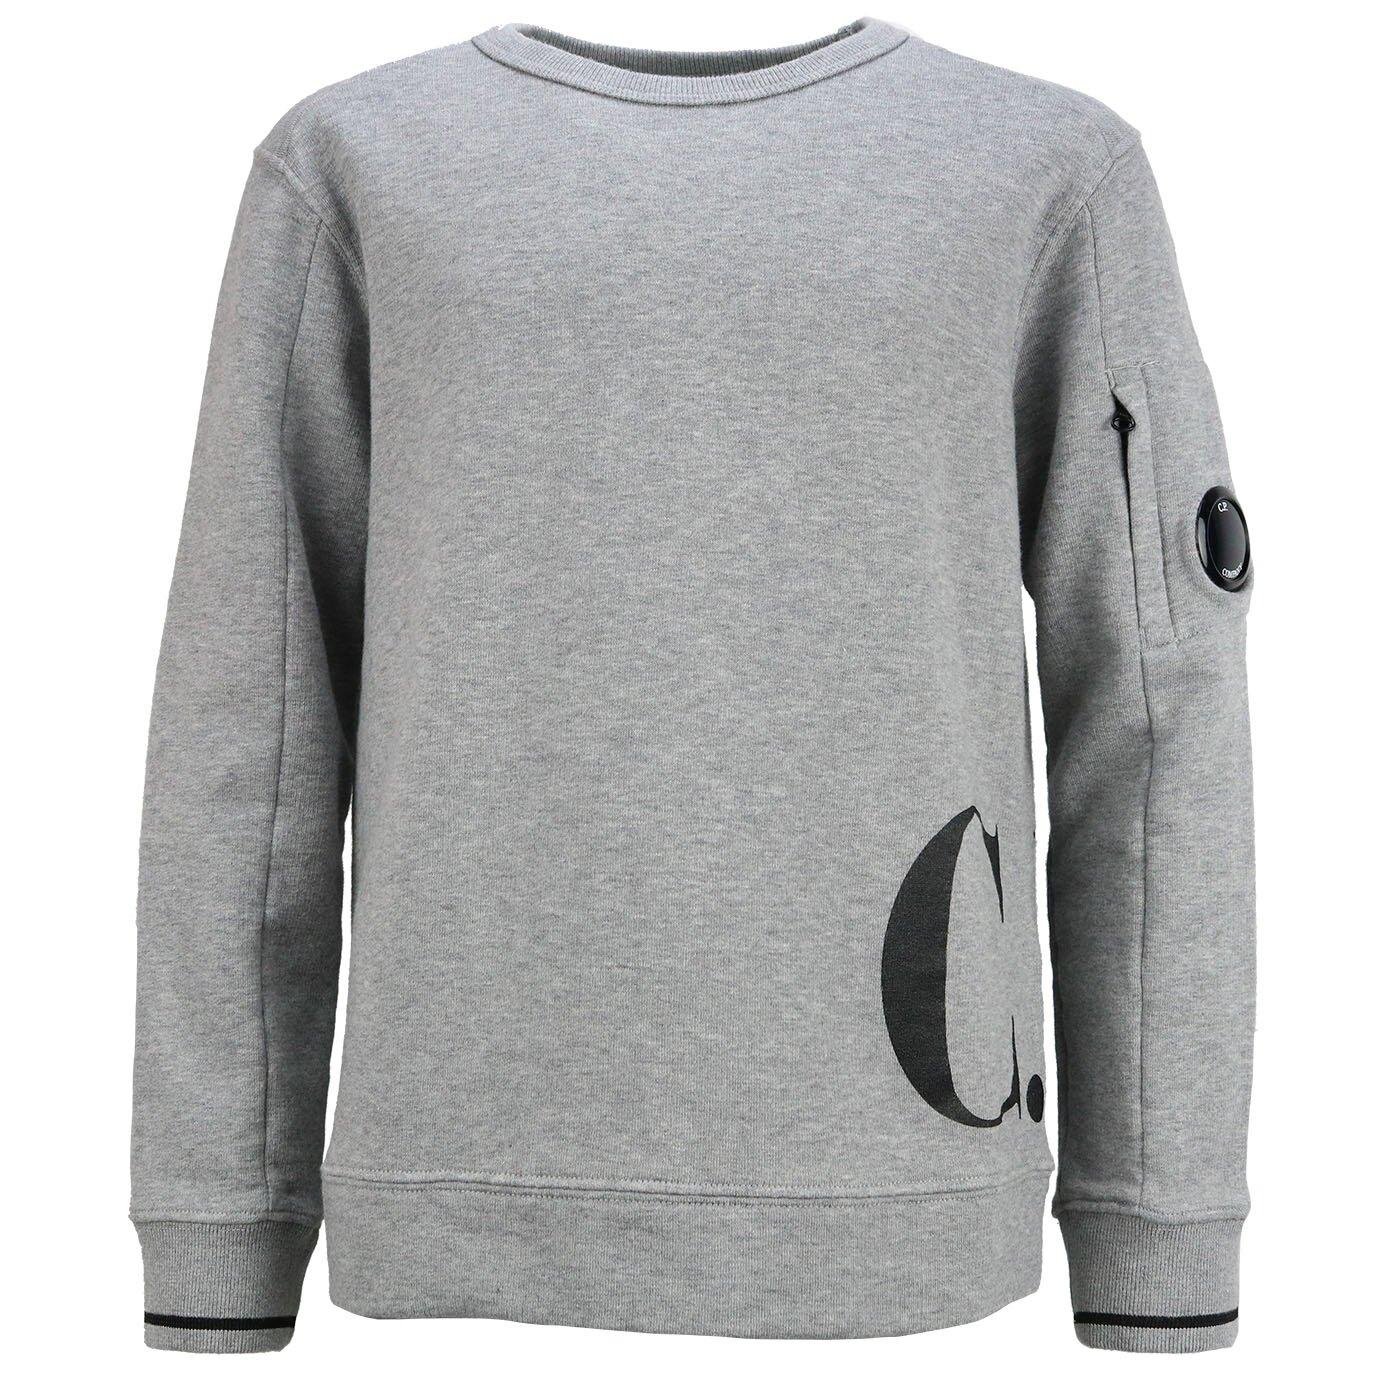 CP Company Sweatshirt Grijs 10CKSS065